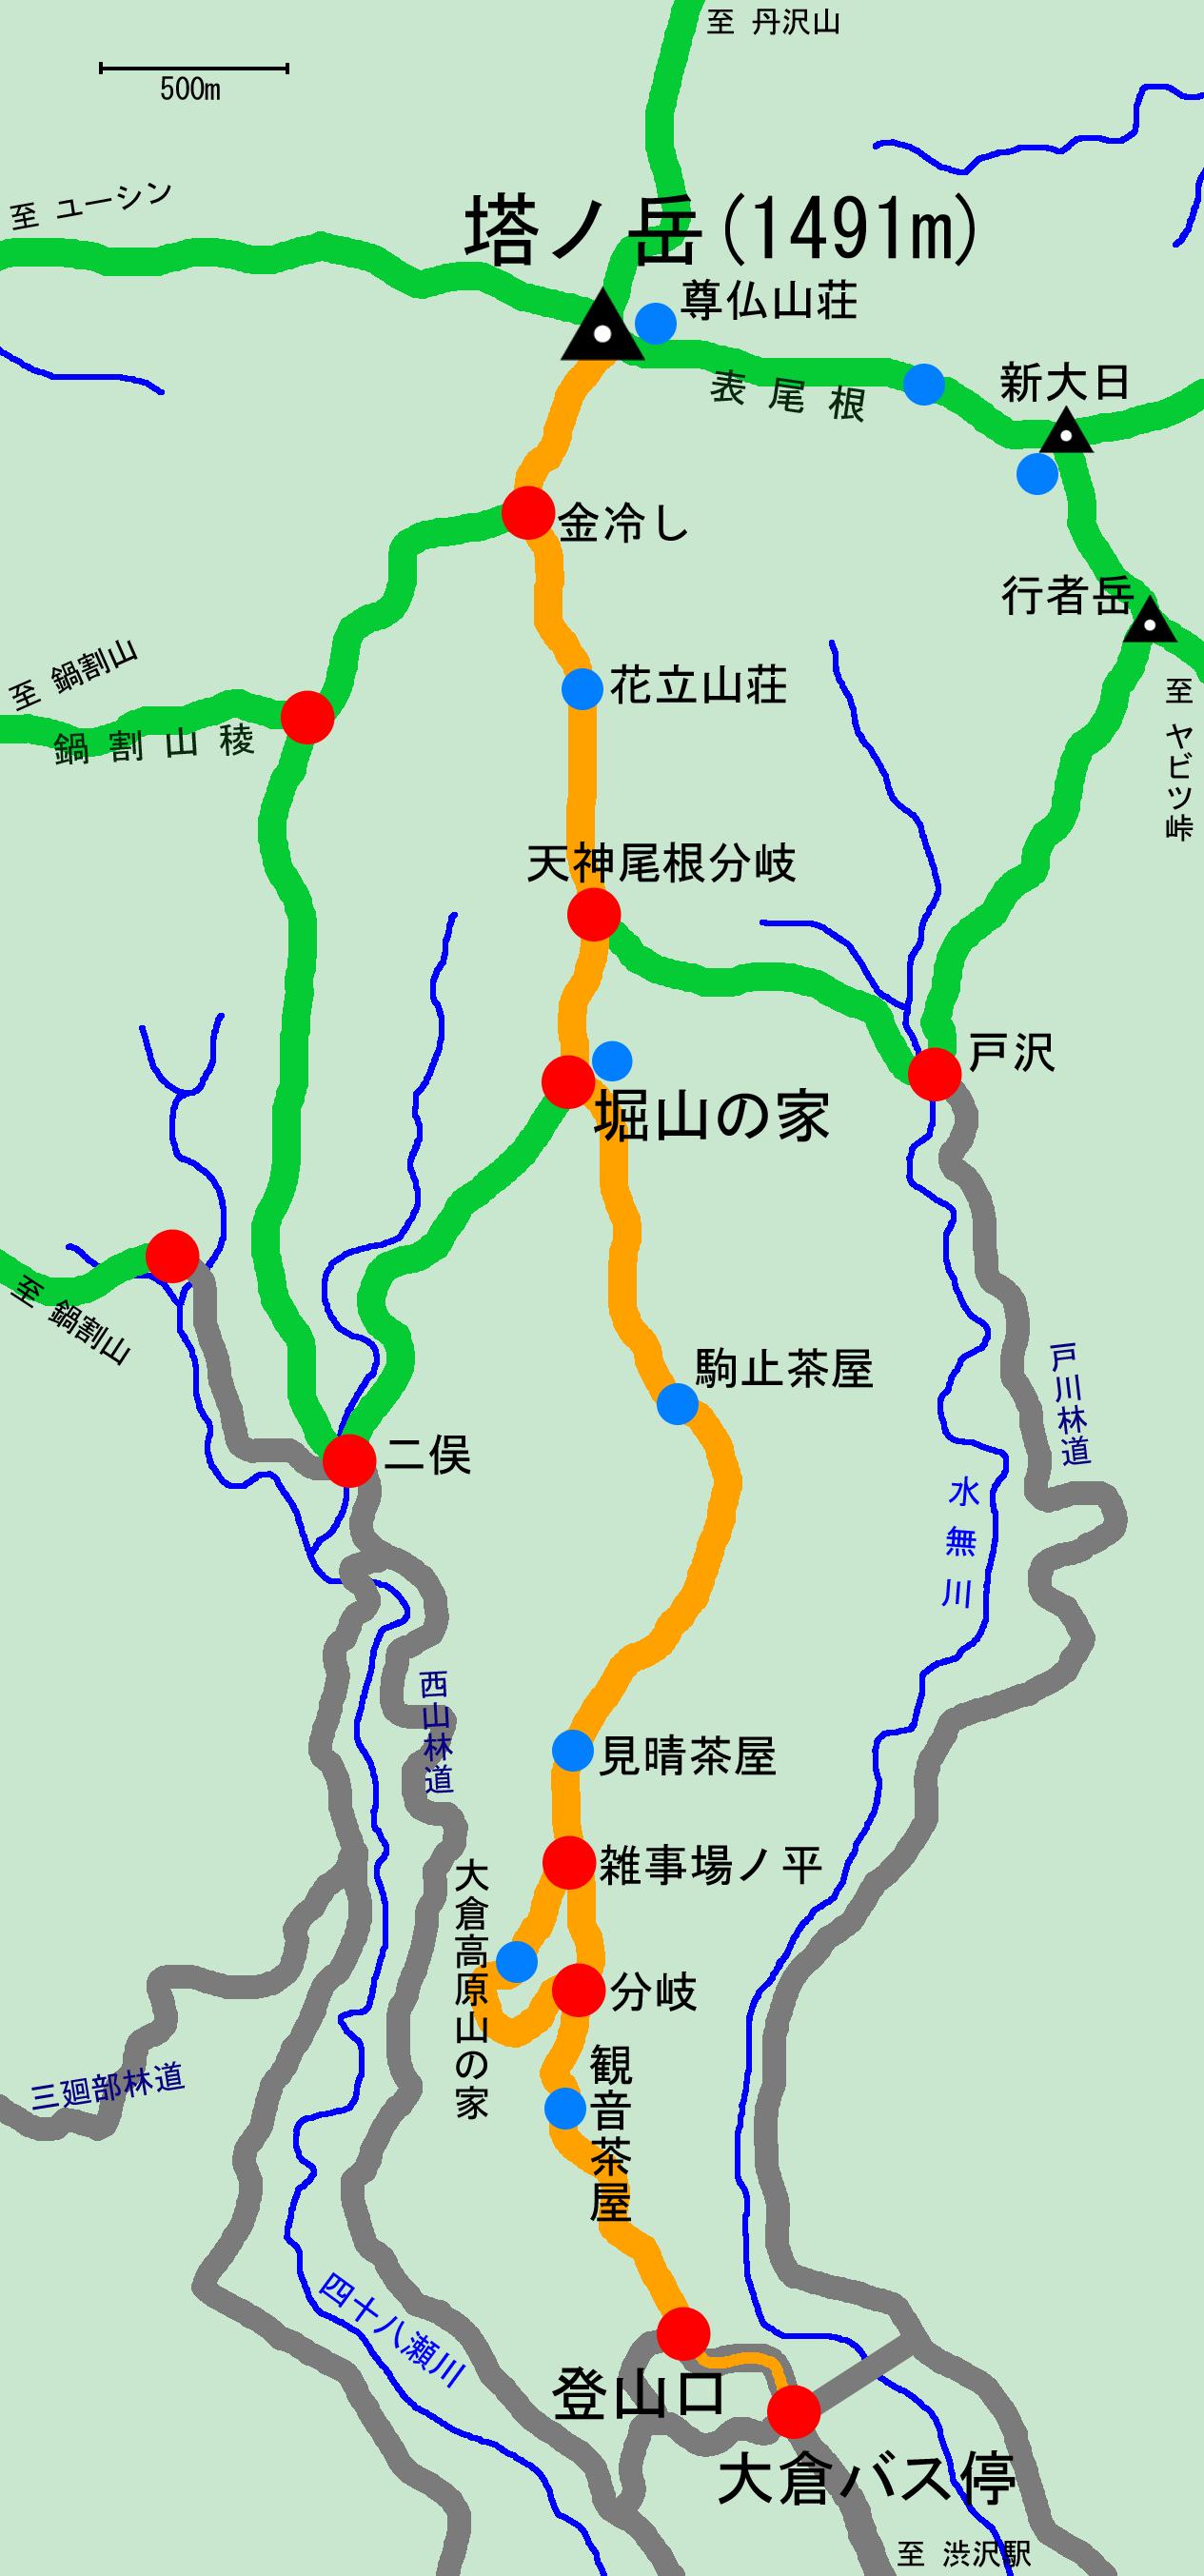 Okura-ridge map.png